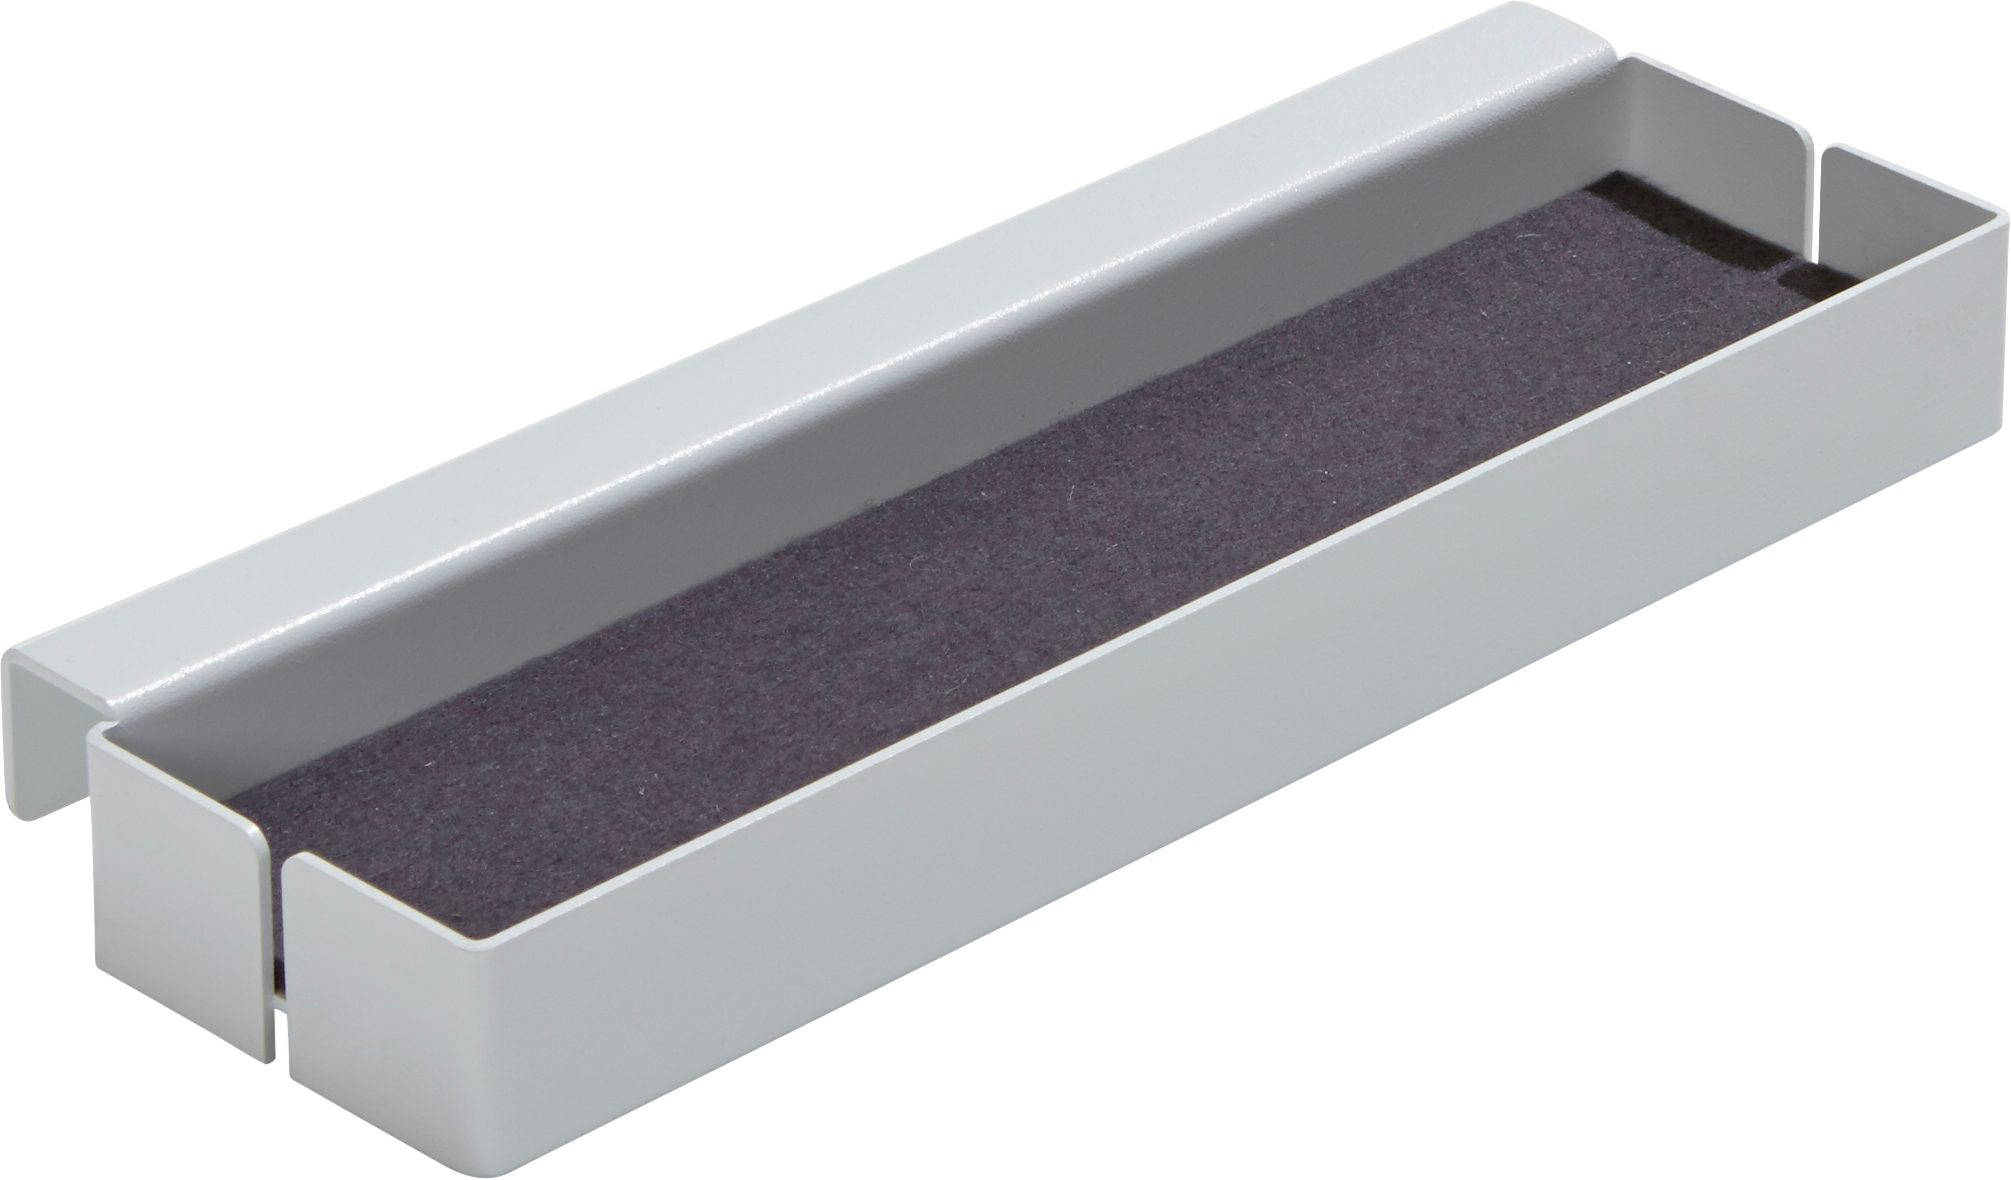 müller Möbelwerkstätten® Ablageelement, als Ergänzung zu Bett »FLAI« oder »PLANE«